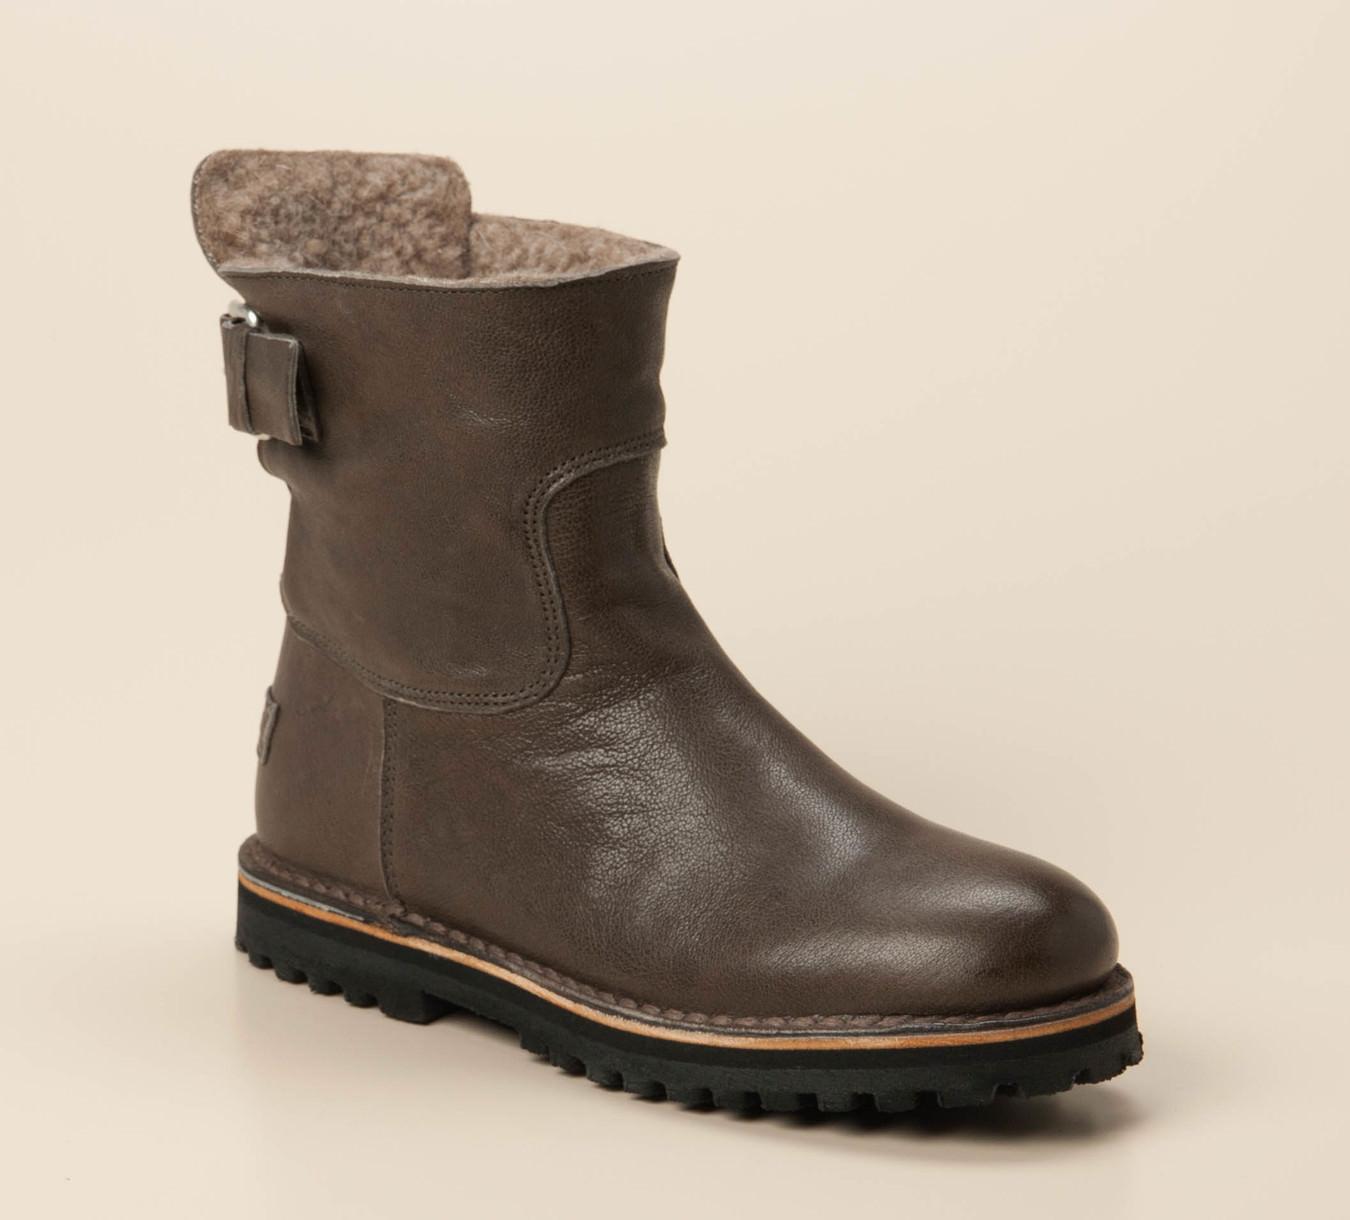 Neu SHABBIES AMSTERDAM STIEFELETTEN Stiefel Boots Grau NEU